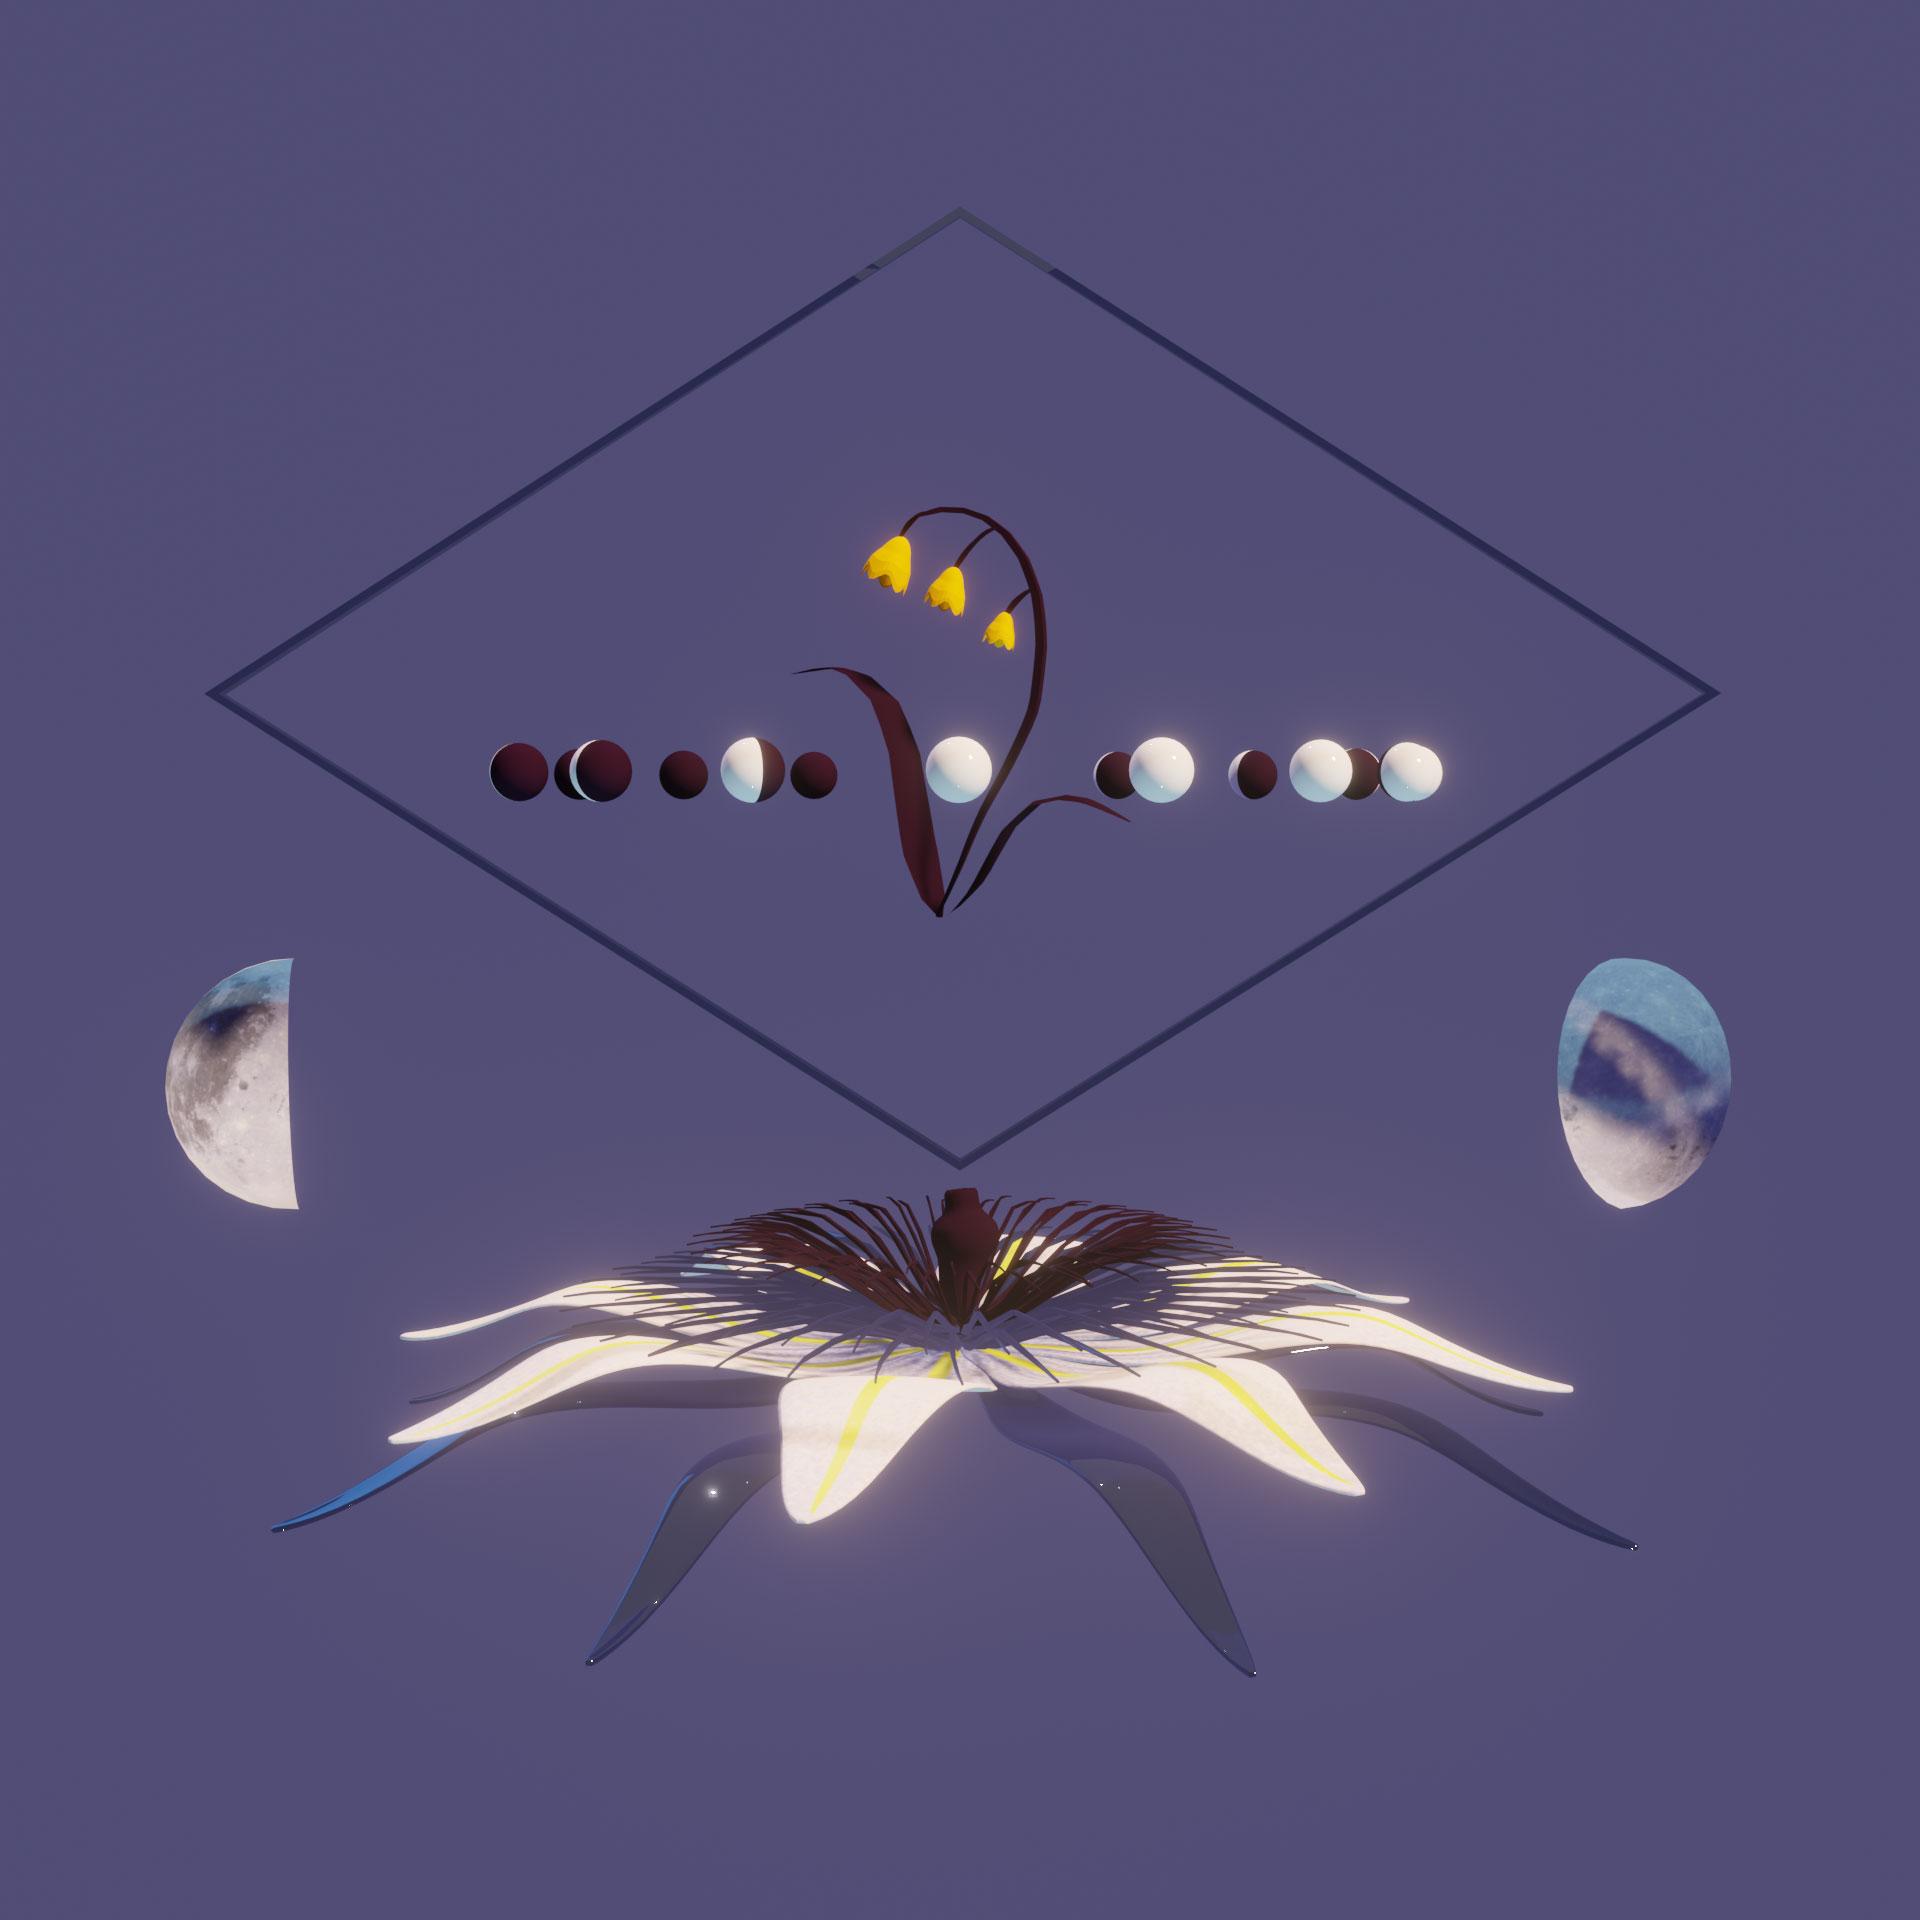 Flower Moon - AR Artwork by Dunaway Smith